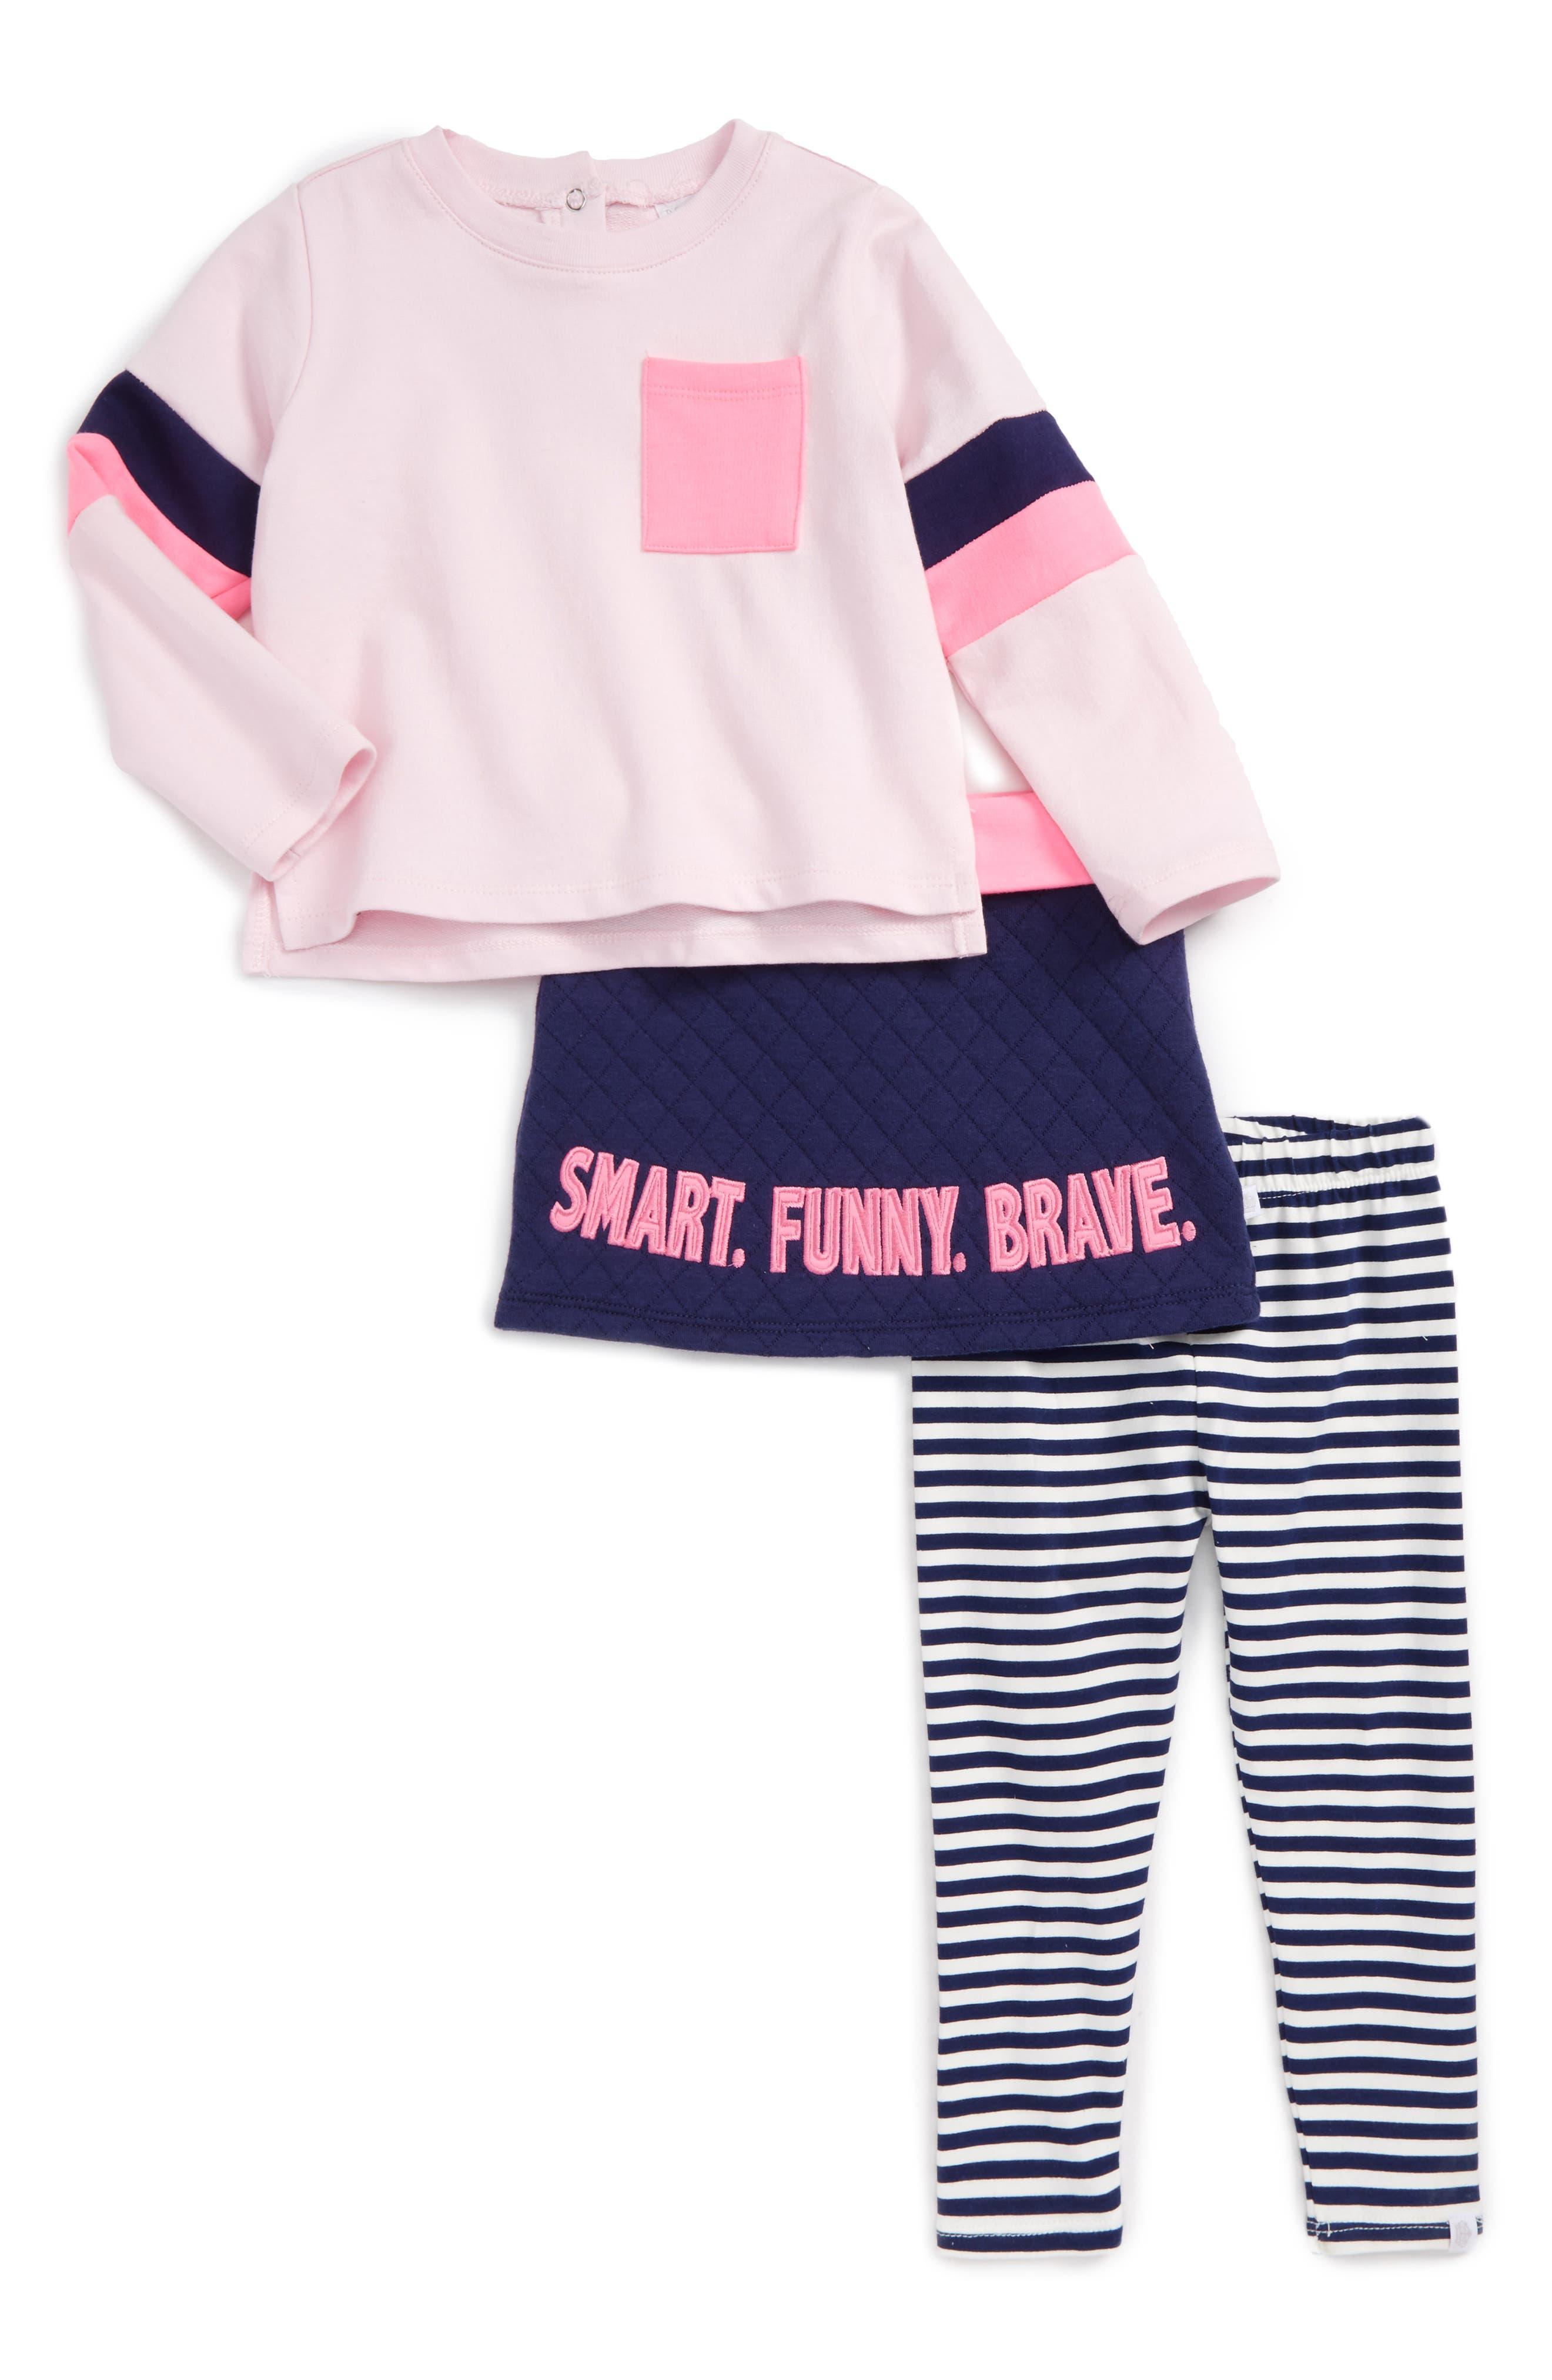 Smart Funny Brave Tee, Leggings & Skirt Set,                         Main,                         color, Pink